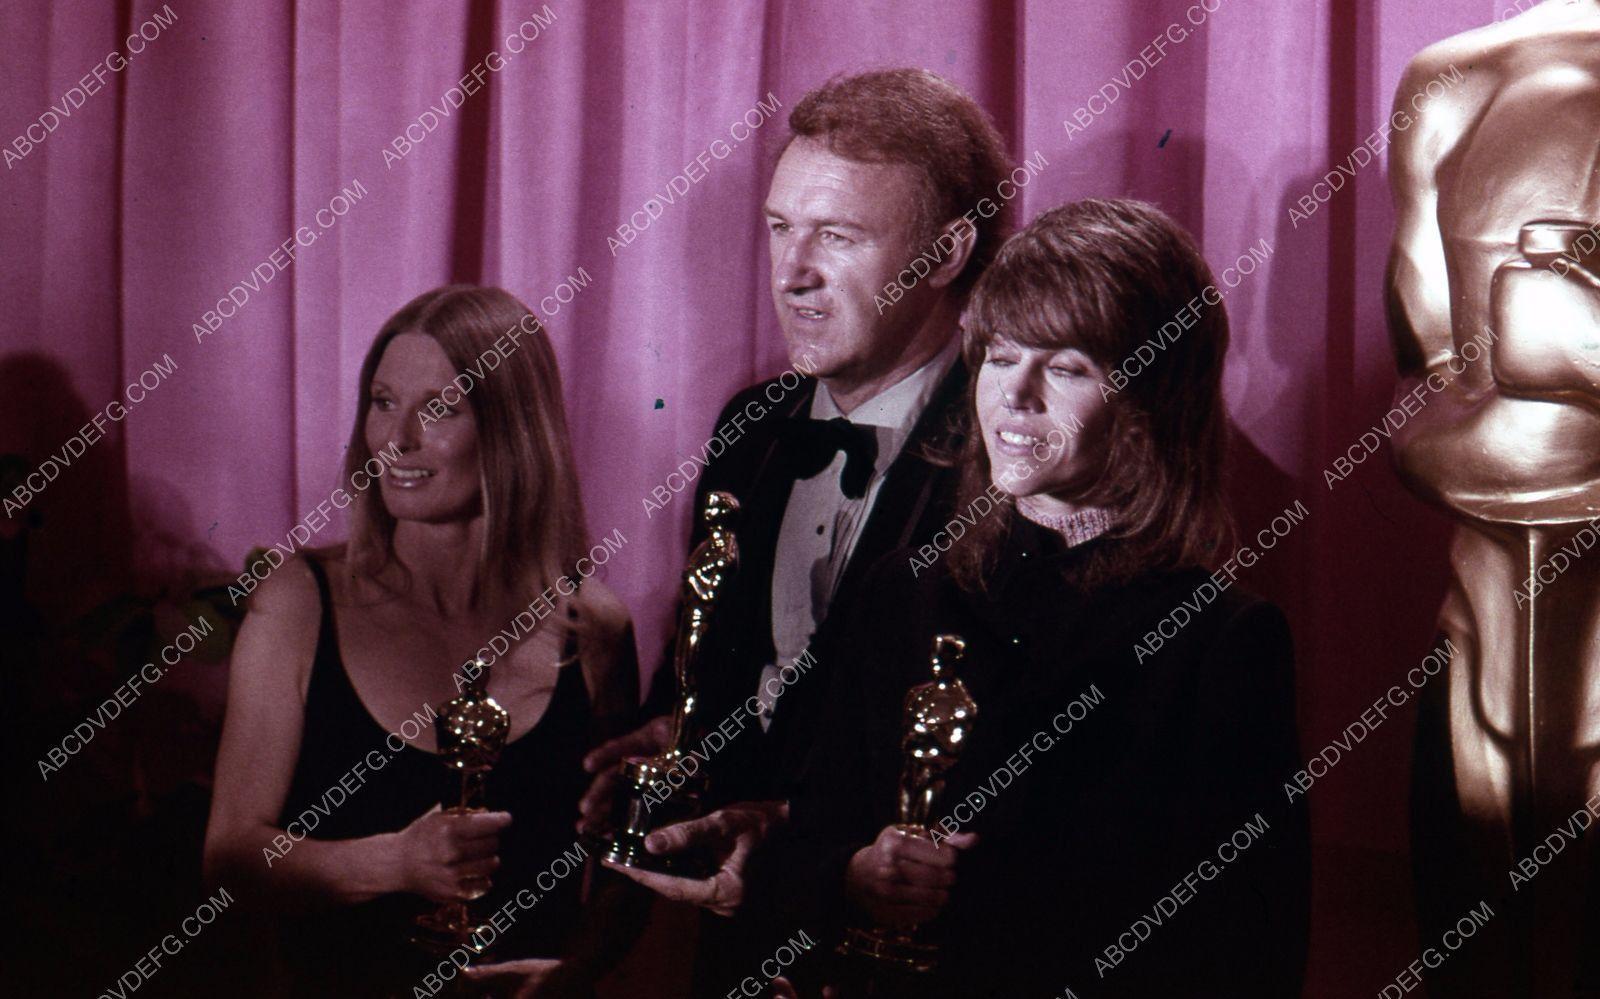 Cloris Leachman Gene Hackman Jane Fonda on stage Academy Awards 35m-4232